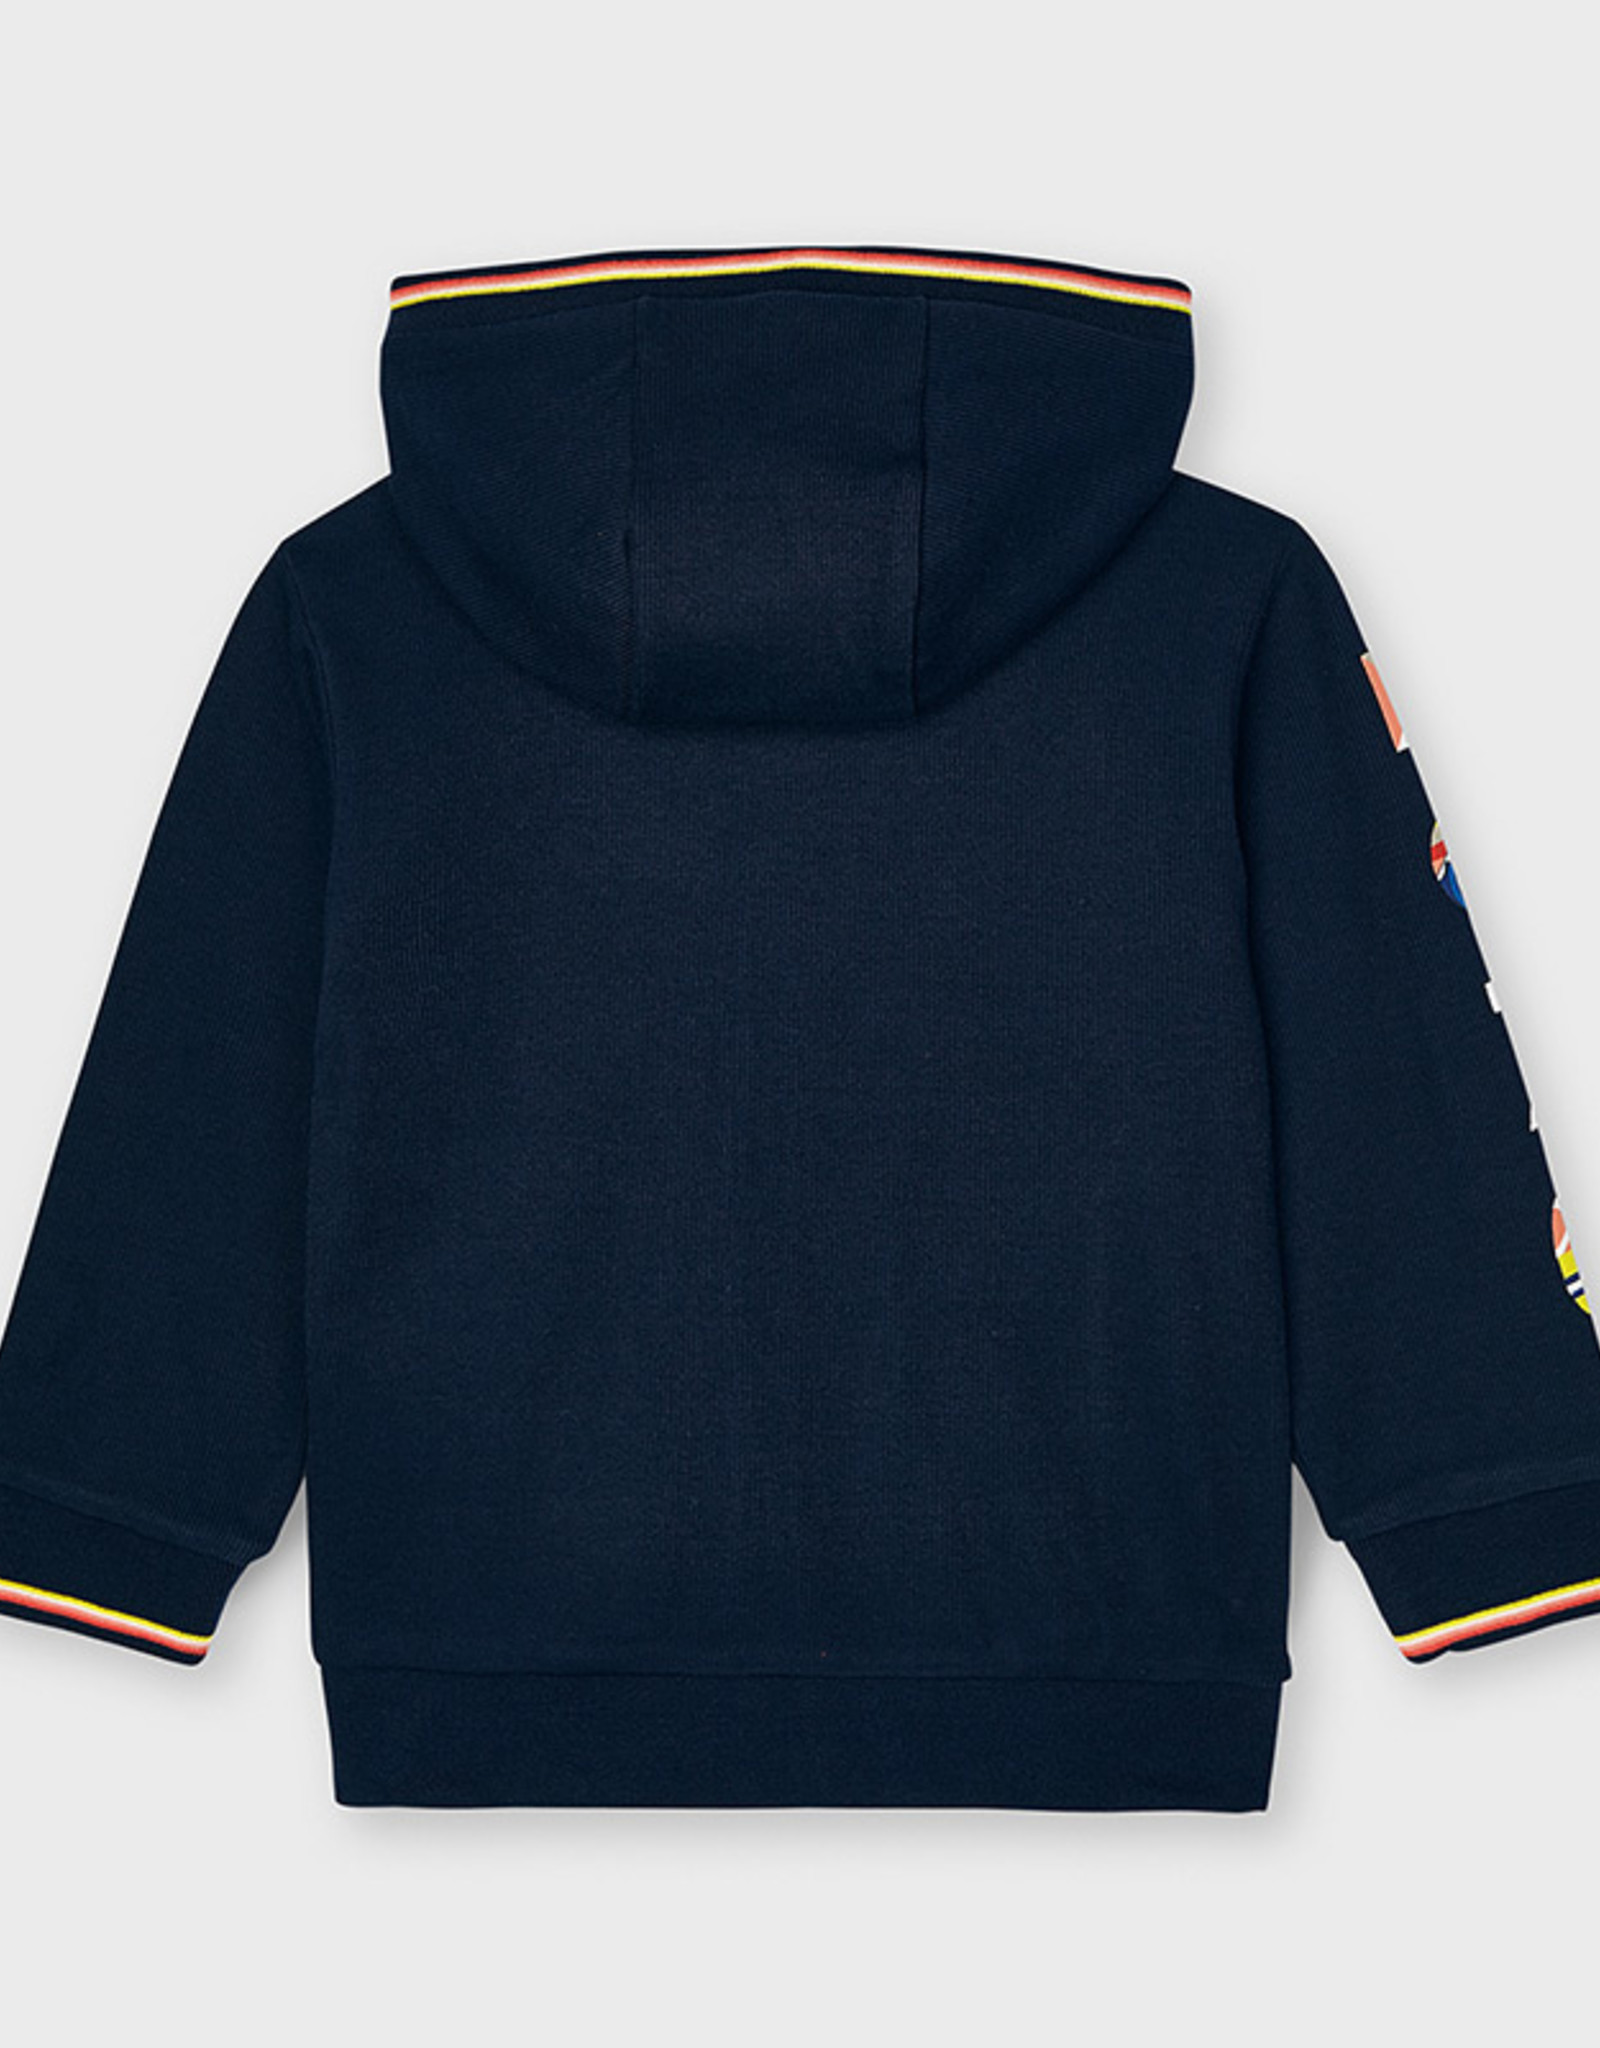 Mayoral Donkerblauwe sweater